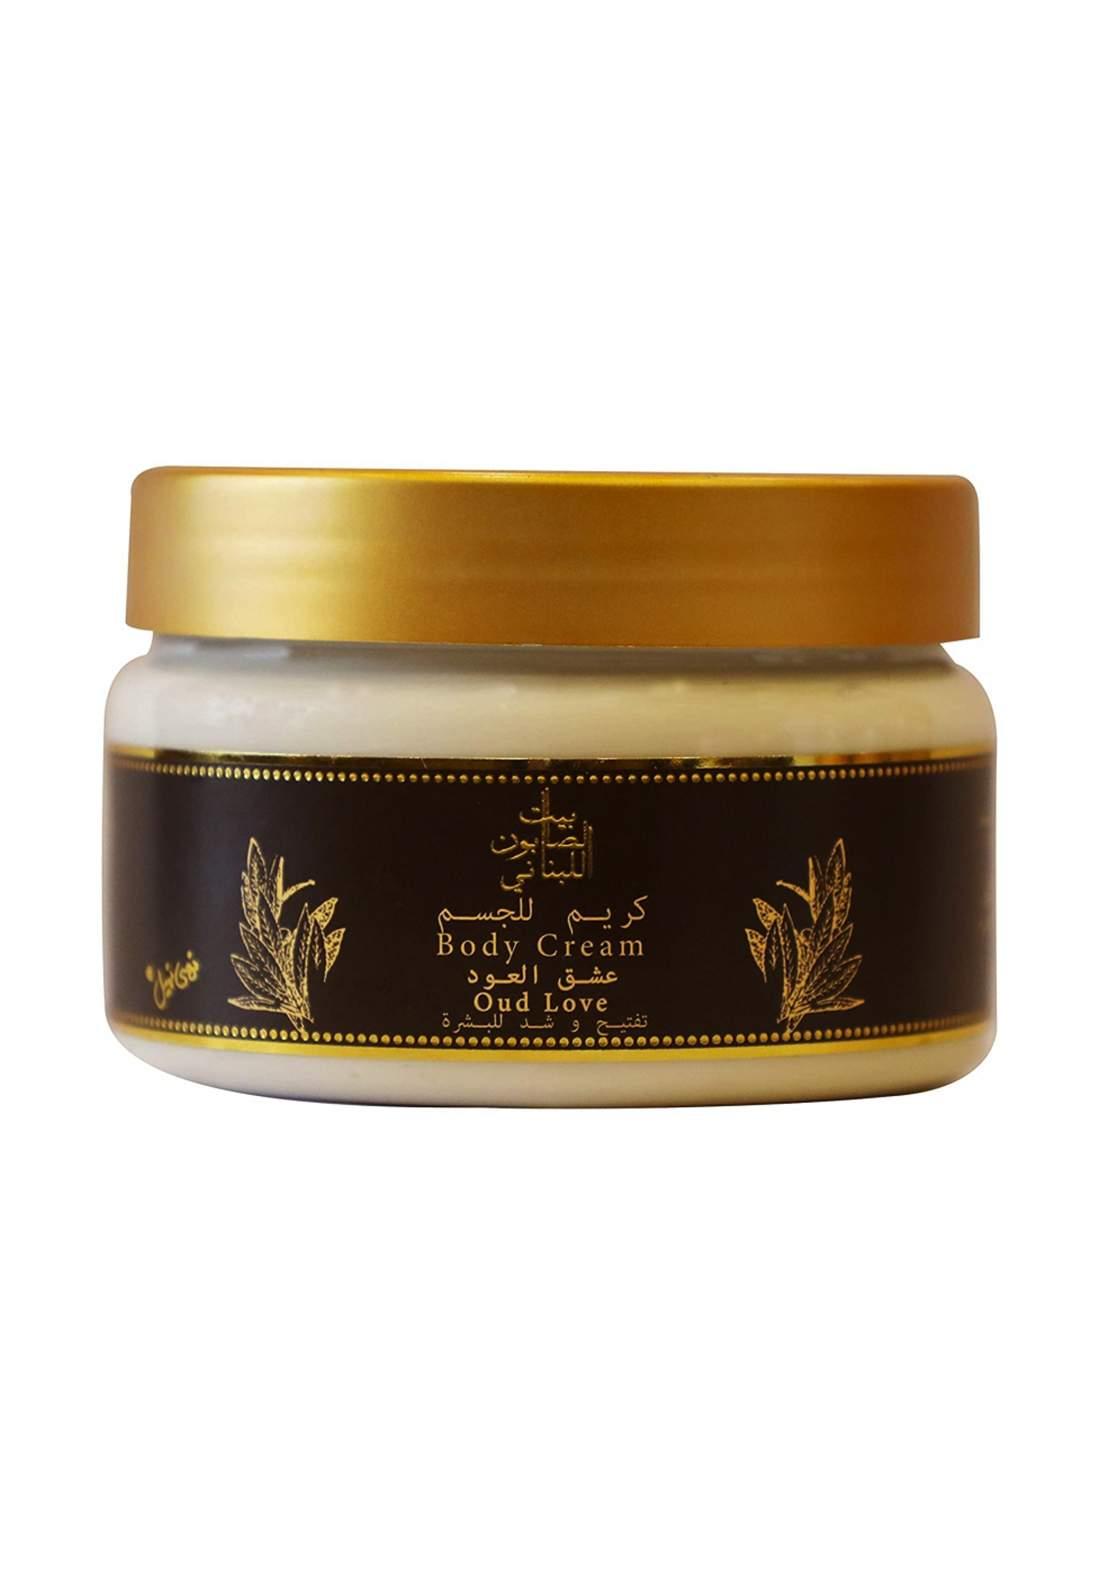 Bayt Alsaboun Alloubnani-317464 Body Cream Oud Love 300g كريم